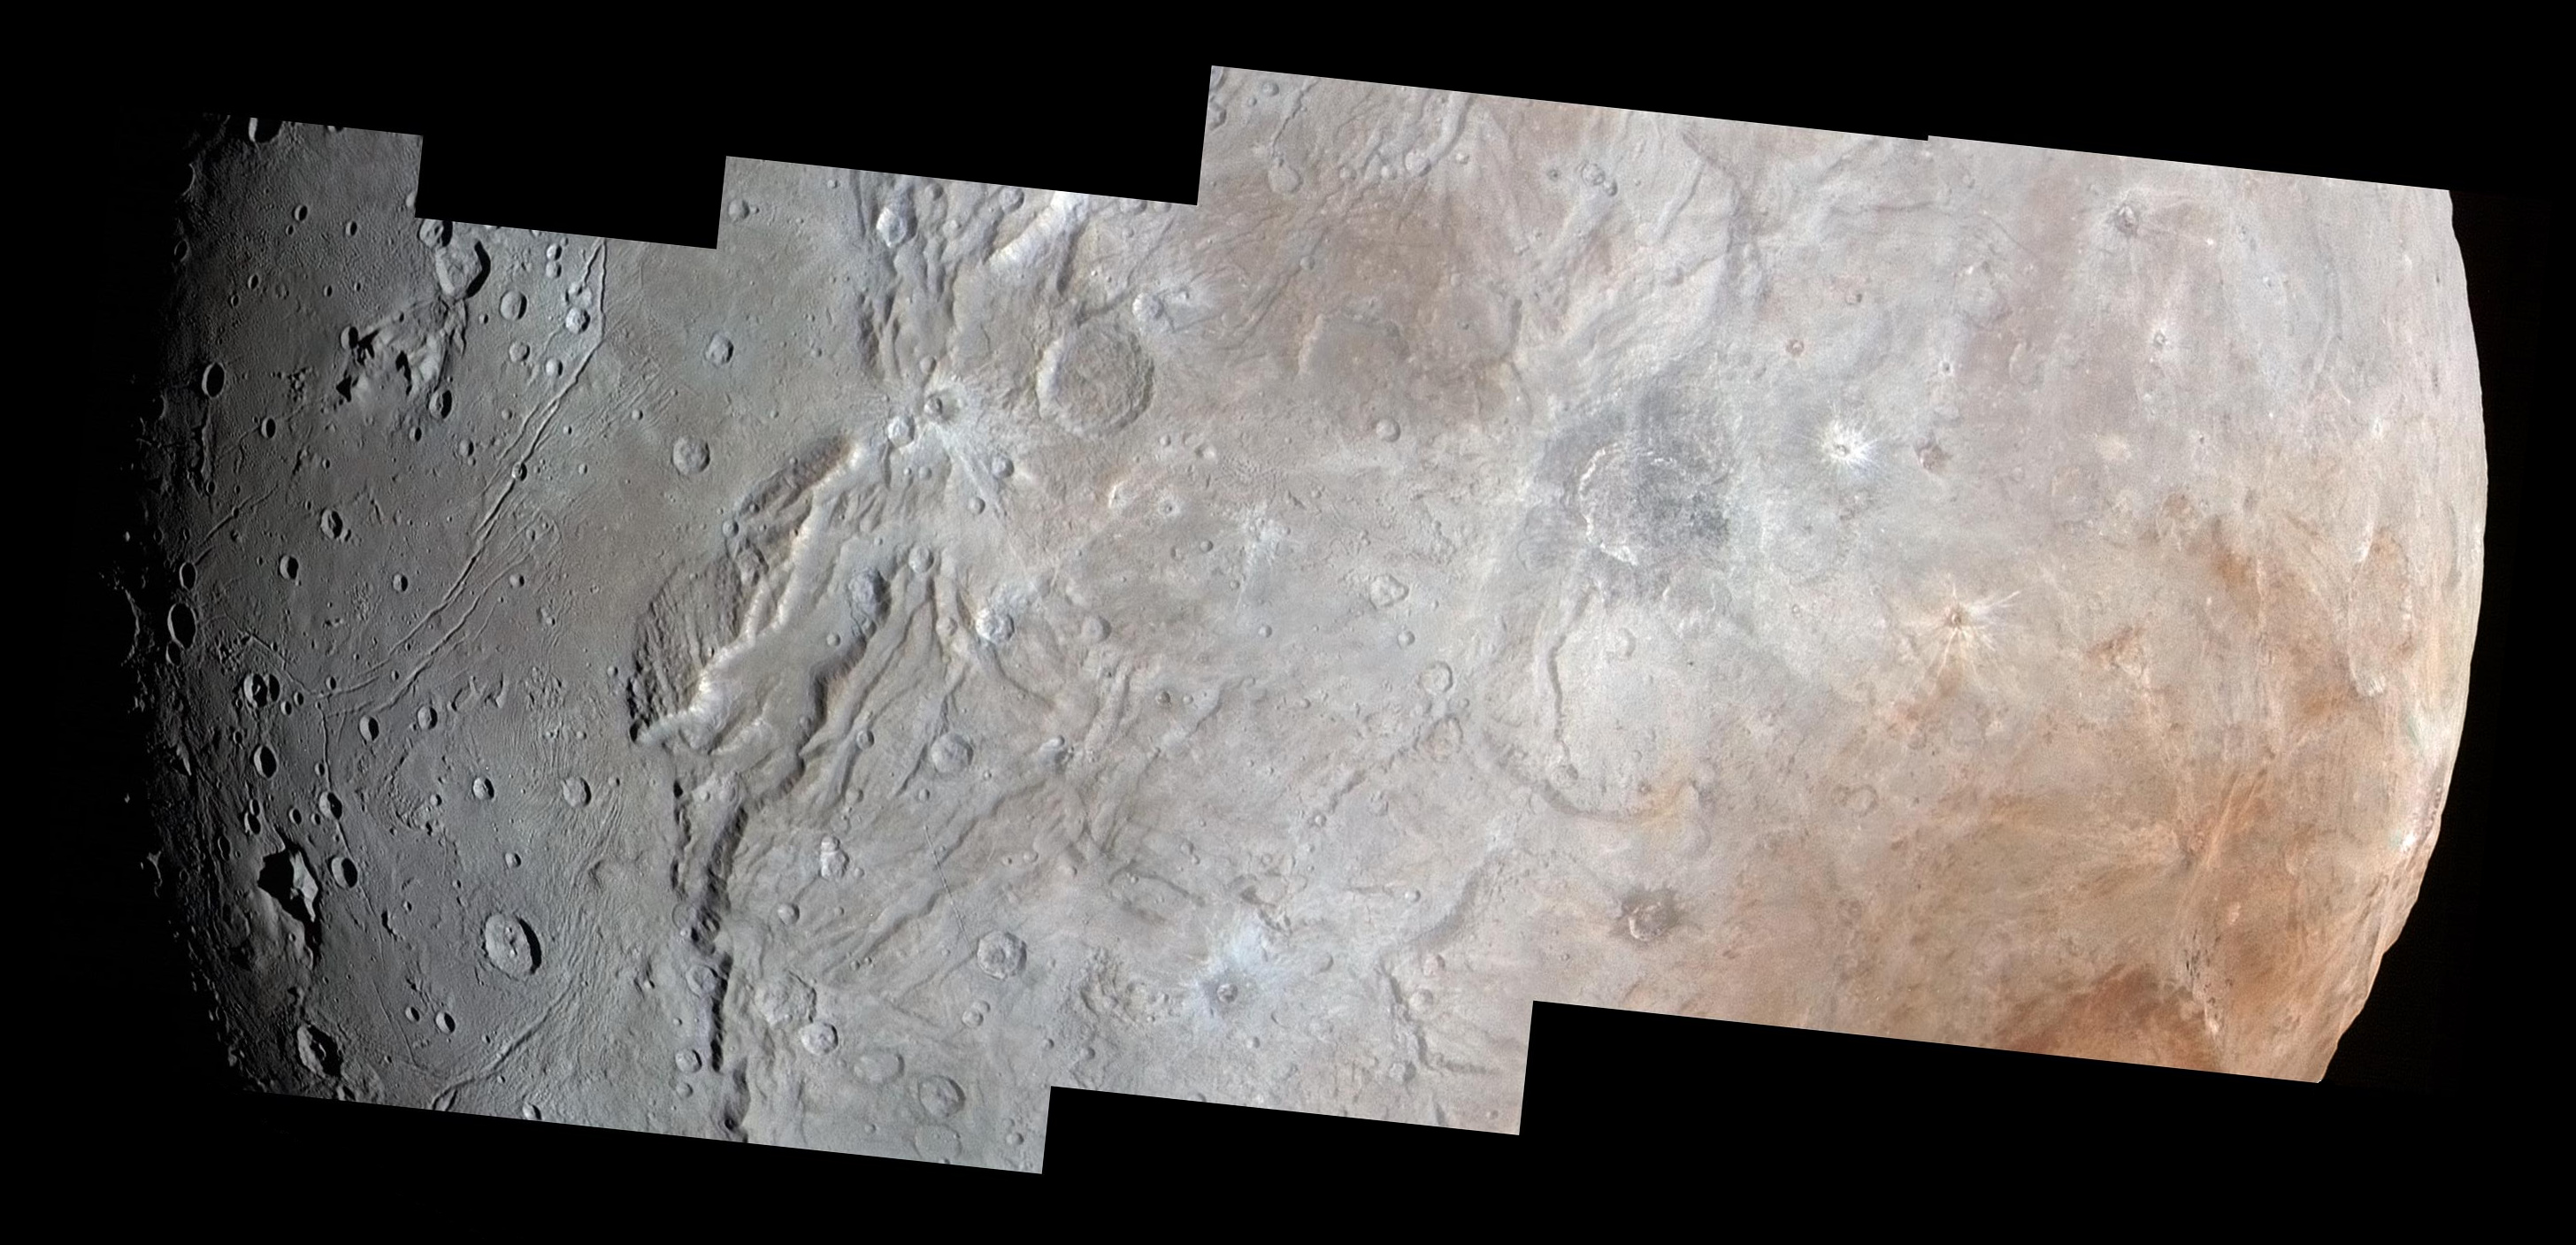 Charon Moon: Pluto's Big Moon Charon Reveals A Colourful & Violent